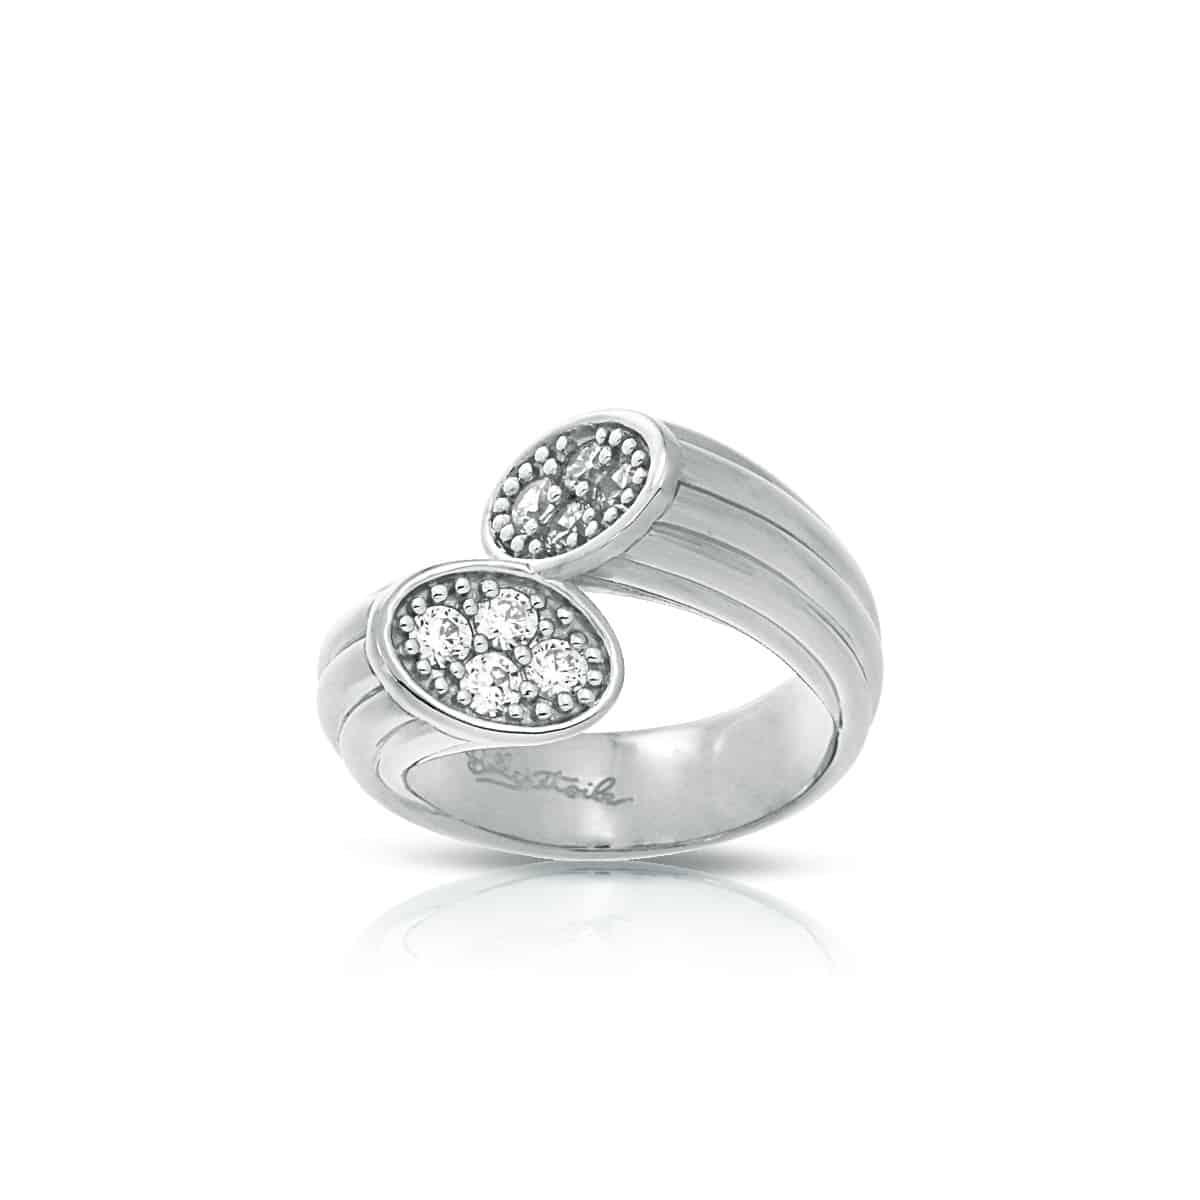 Belle Étoile Cavo White Ring